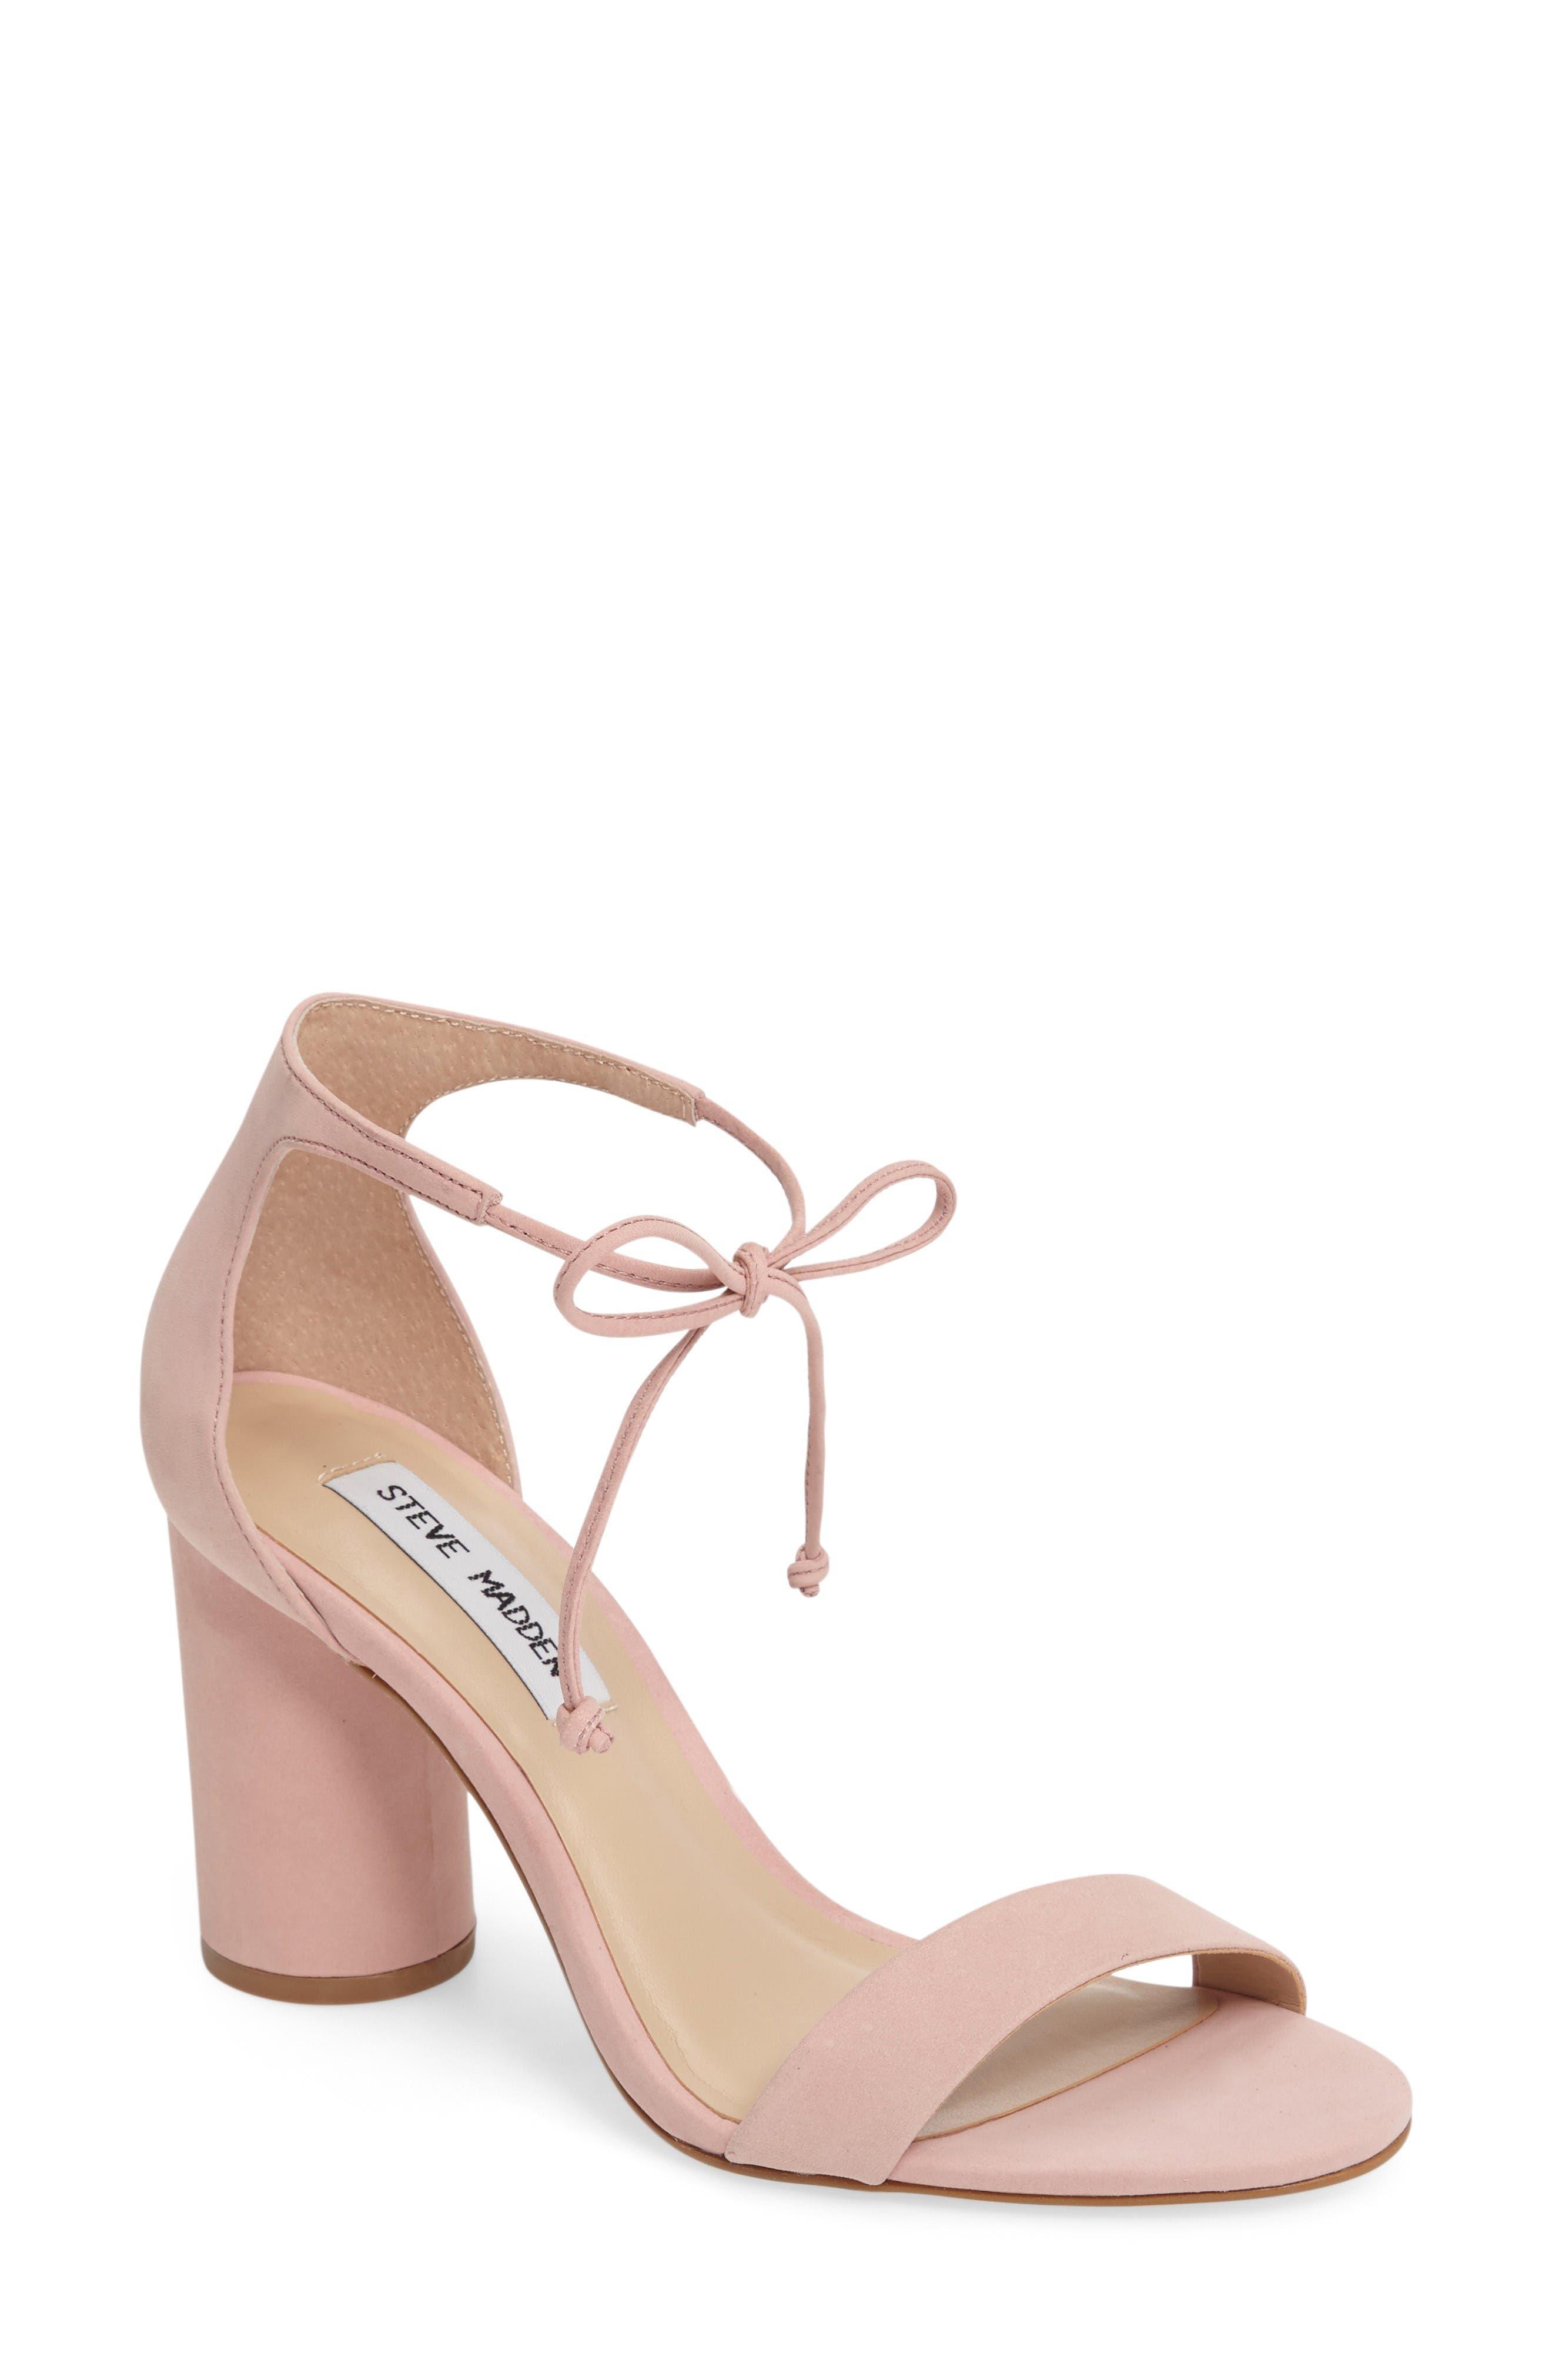 Alternate Image 1 Selected - Steve Madden Shays Lace-Up Sandal (Women)